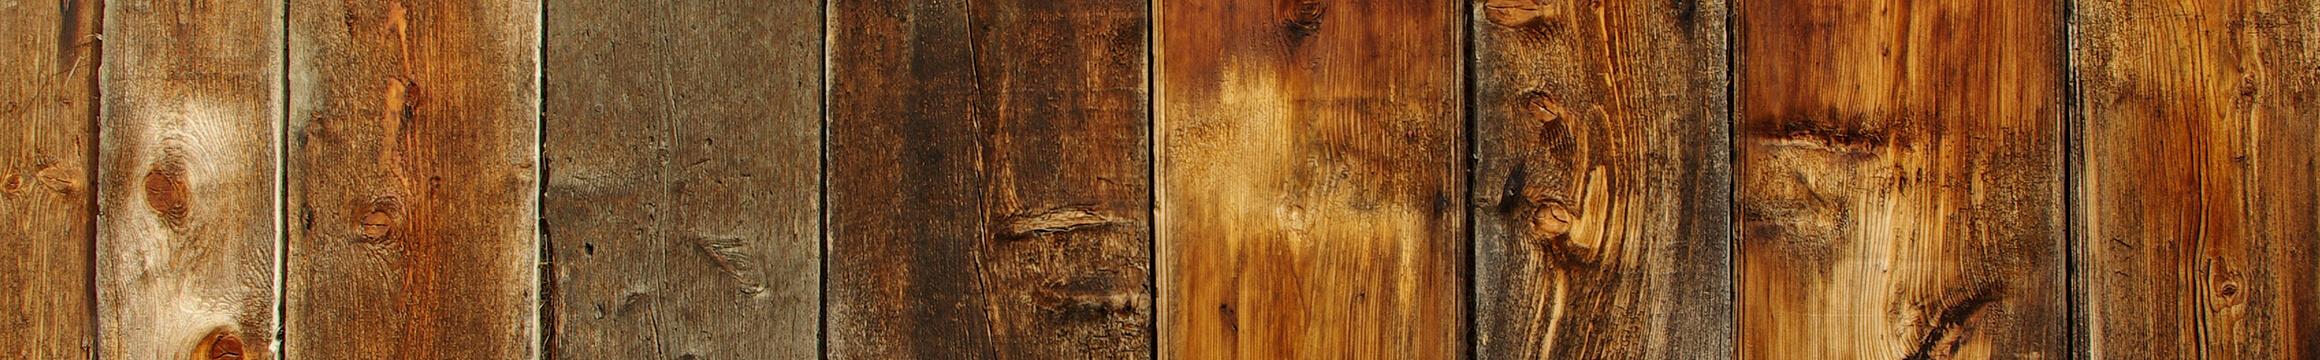 Wood Rustic 08